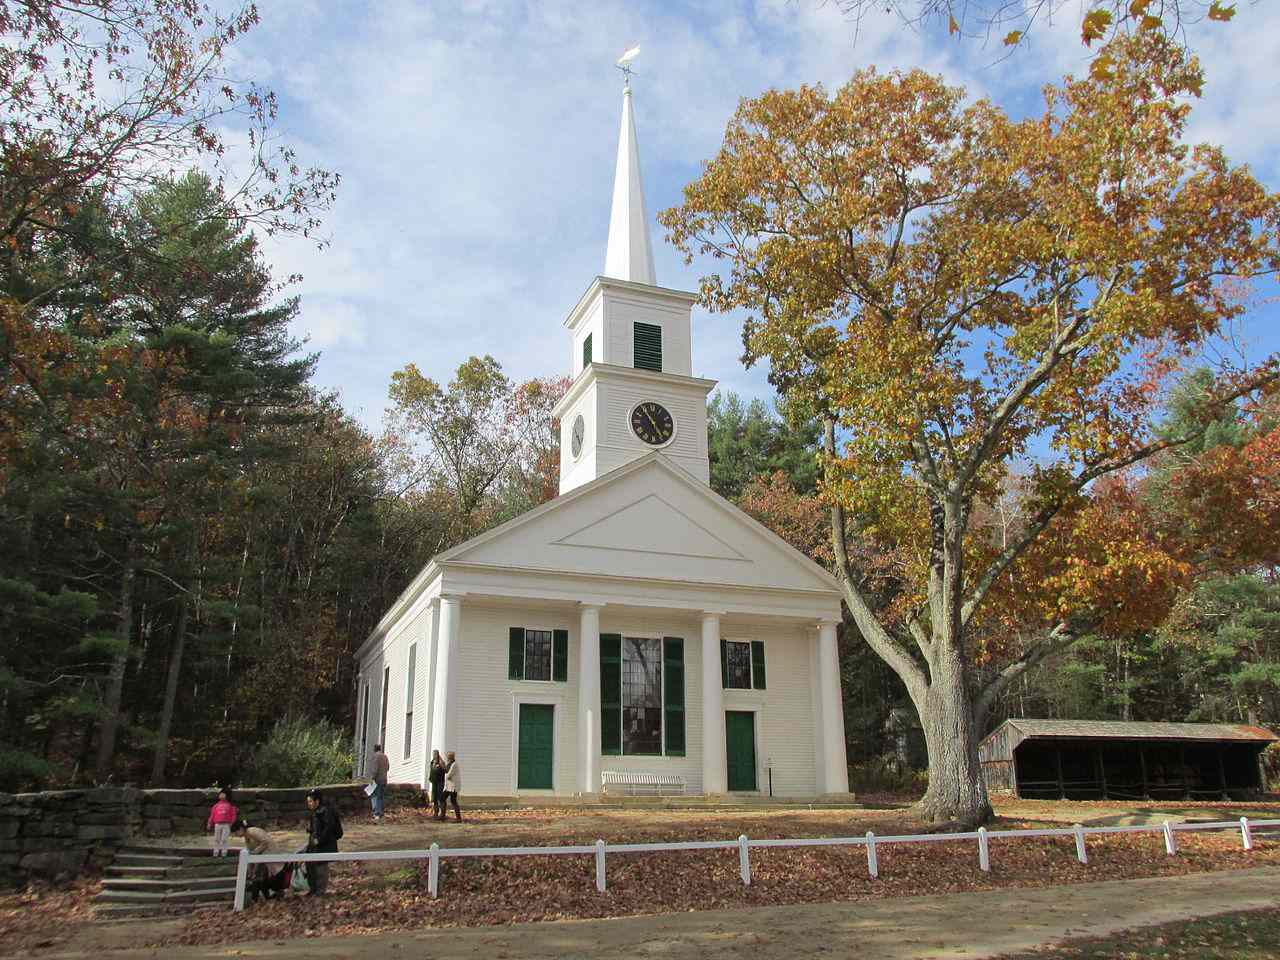 Center Meetinghouse, Old Sturbridge Village, Massachusetts